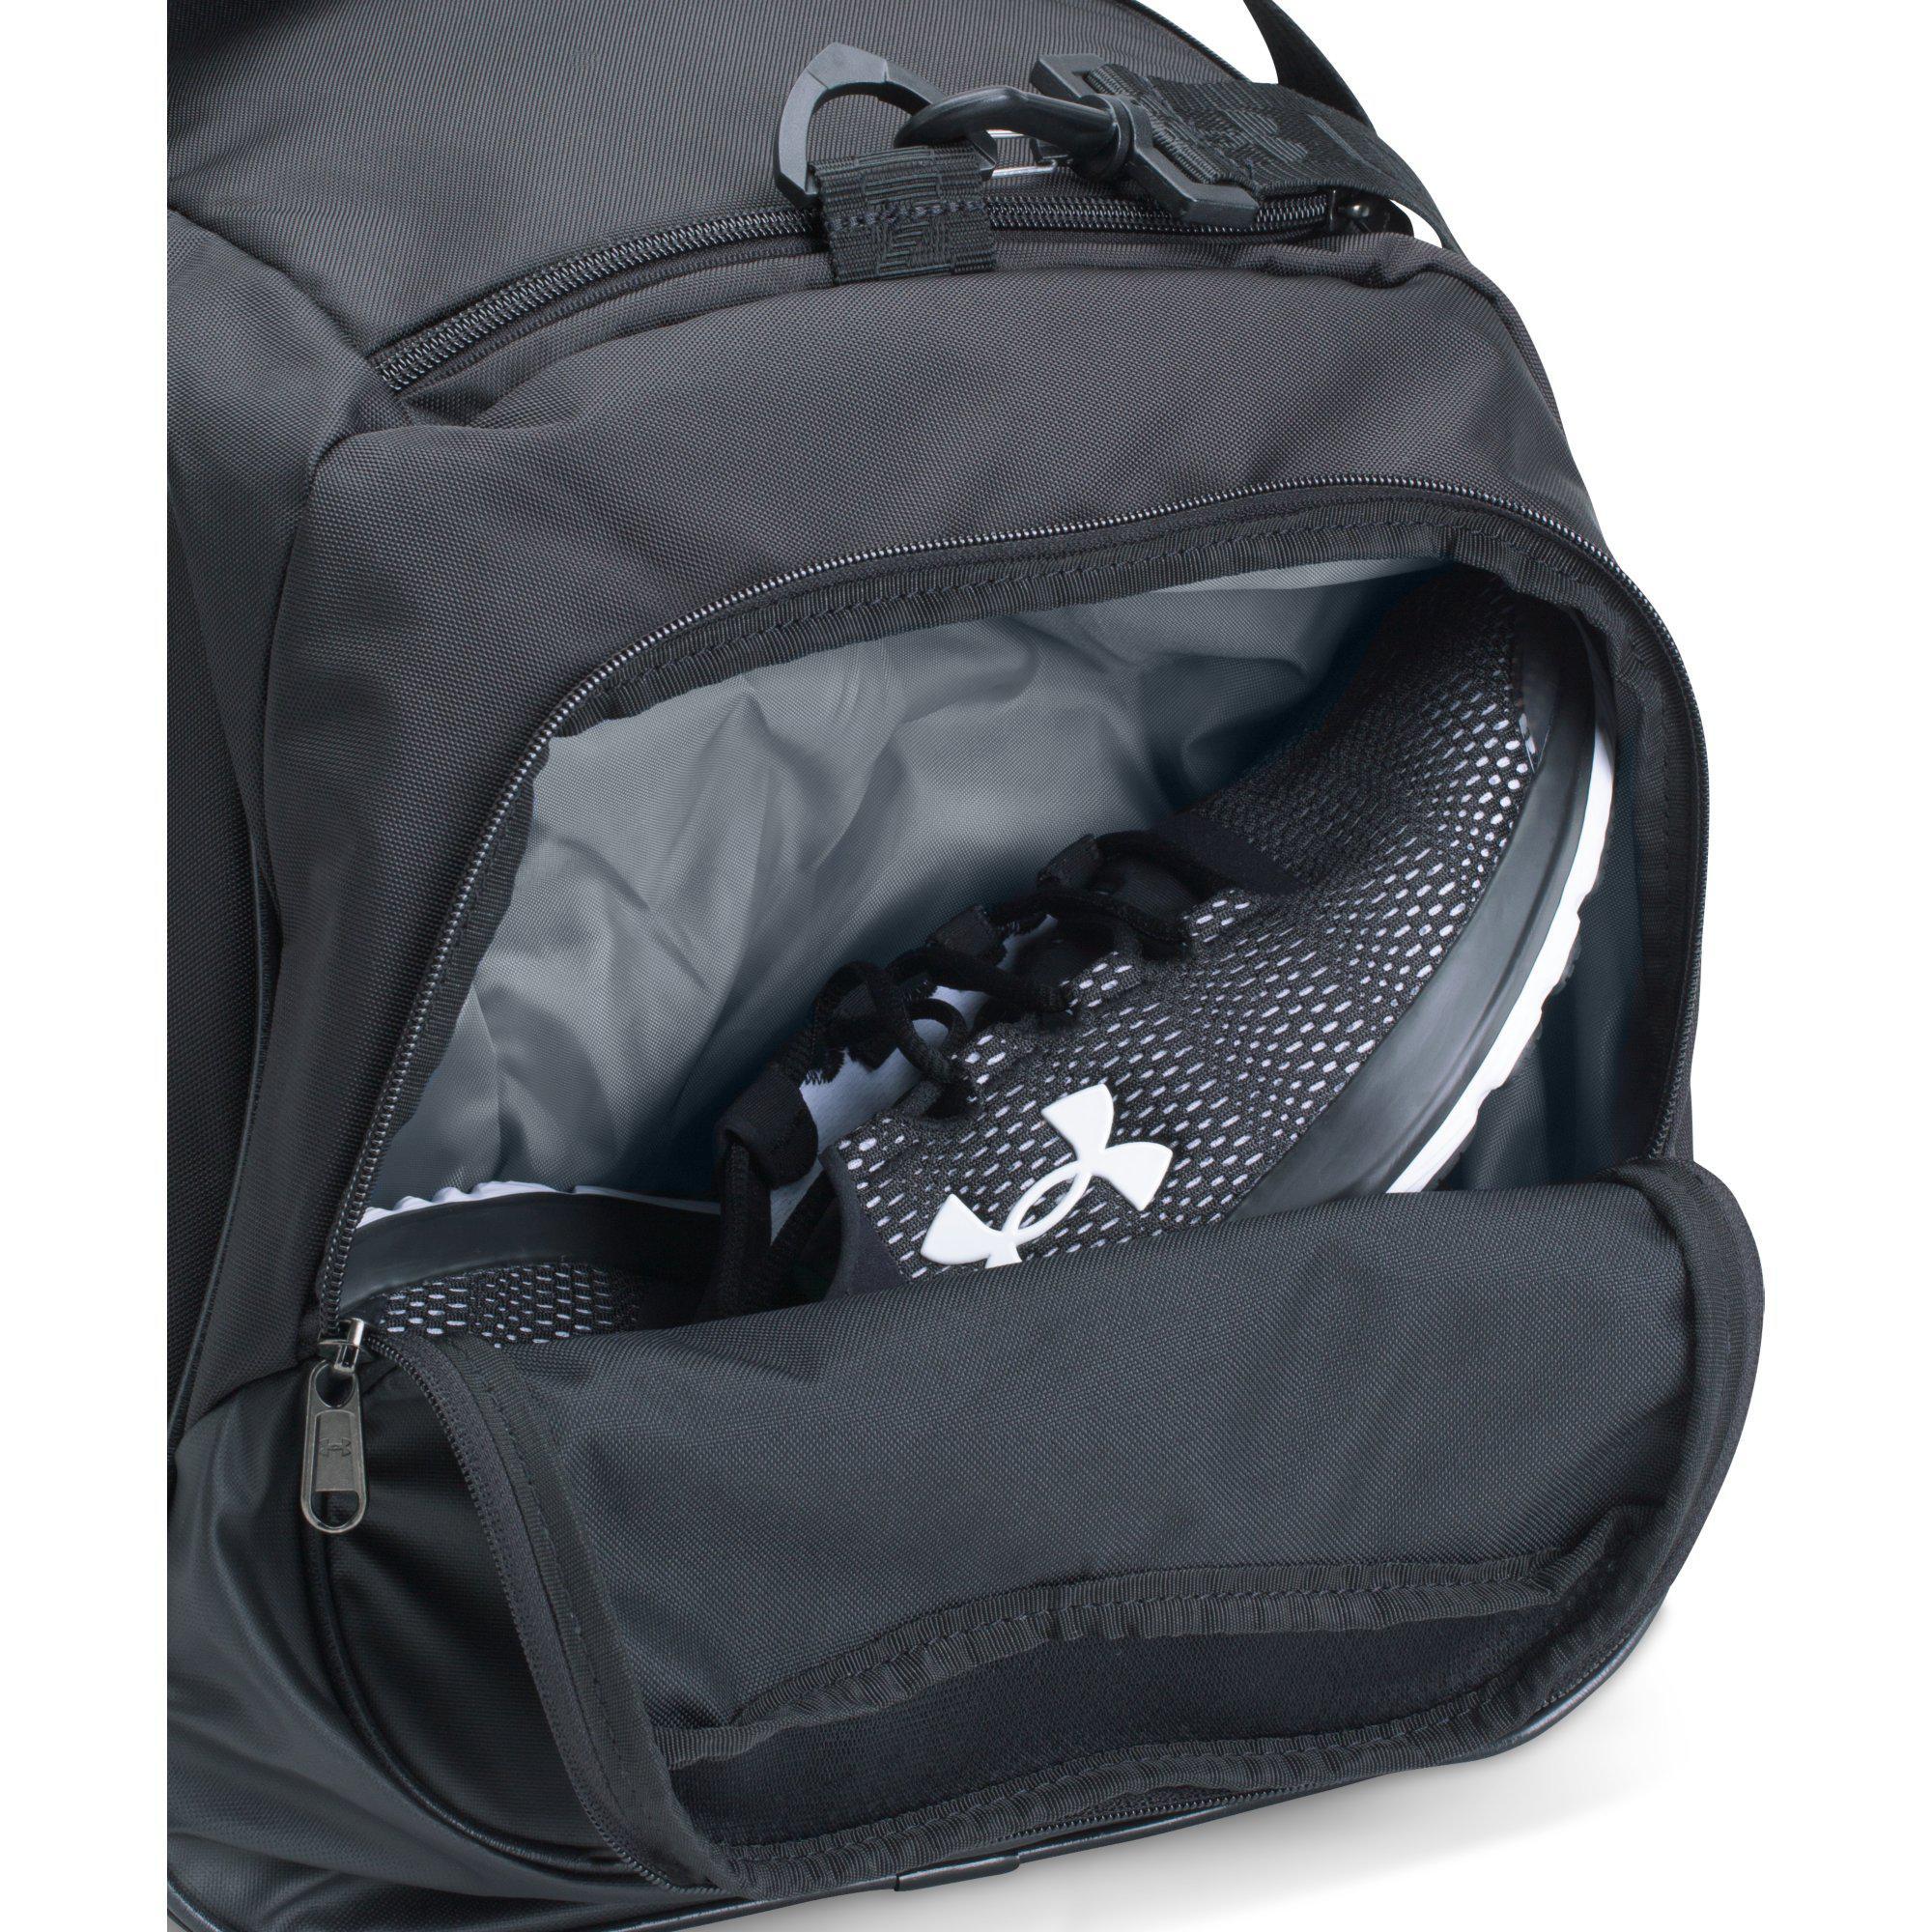 b35050b2ab9a Under Armour Storm Undeniable II LG Duffel Bag - Black - Tennisnuts.com